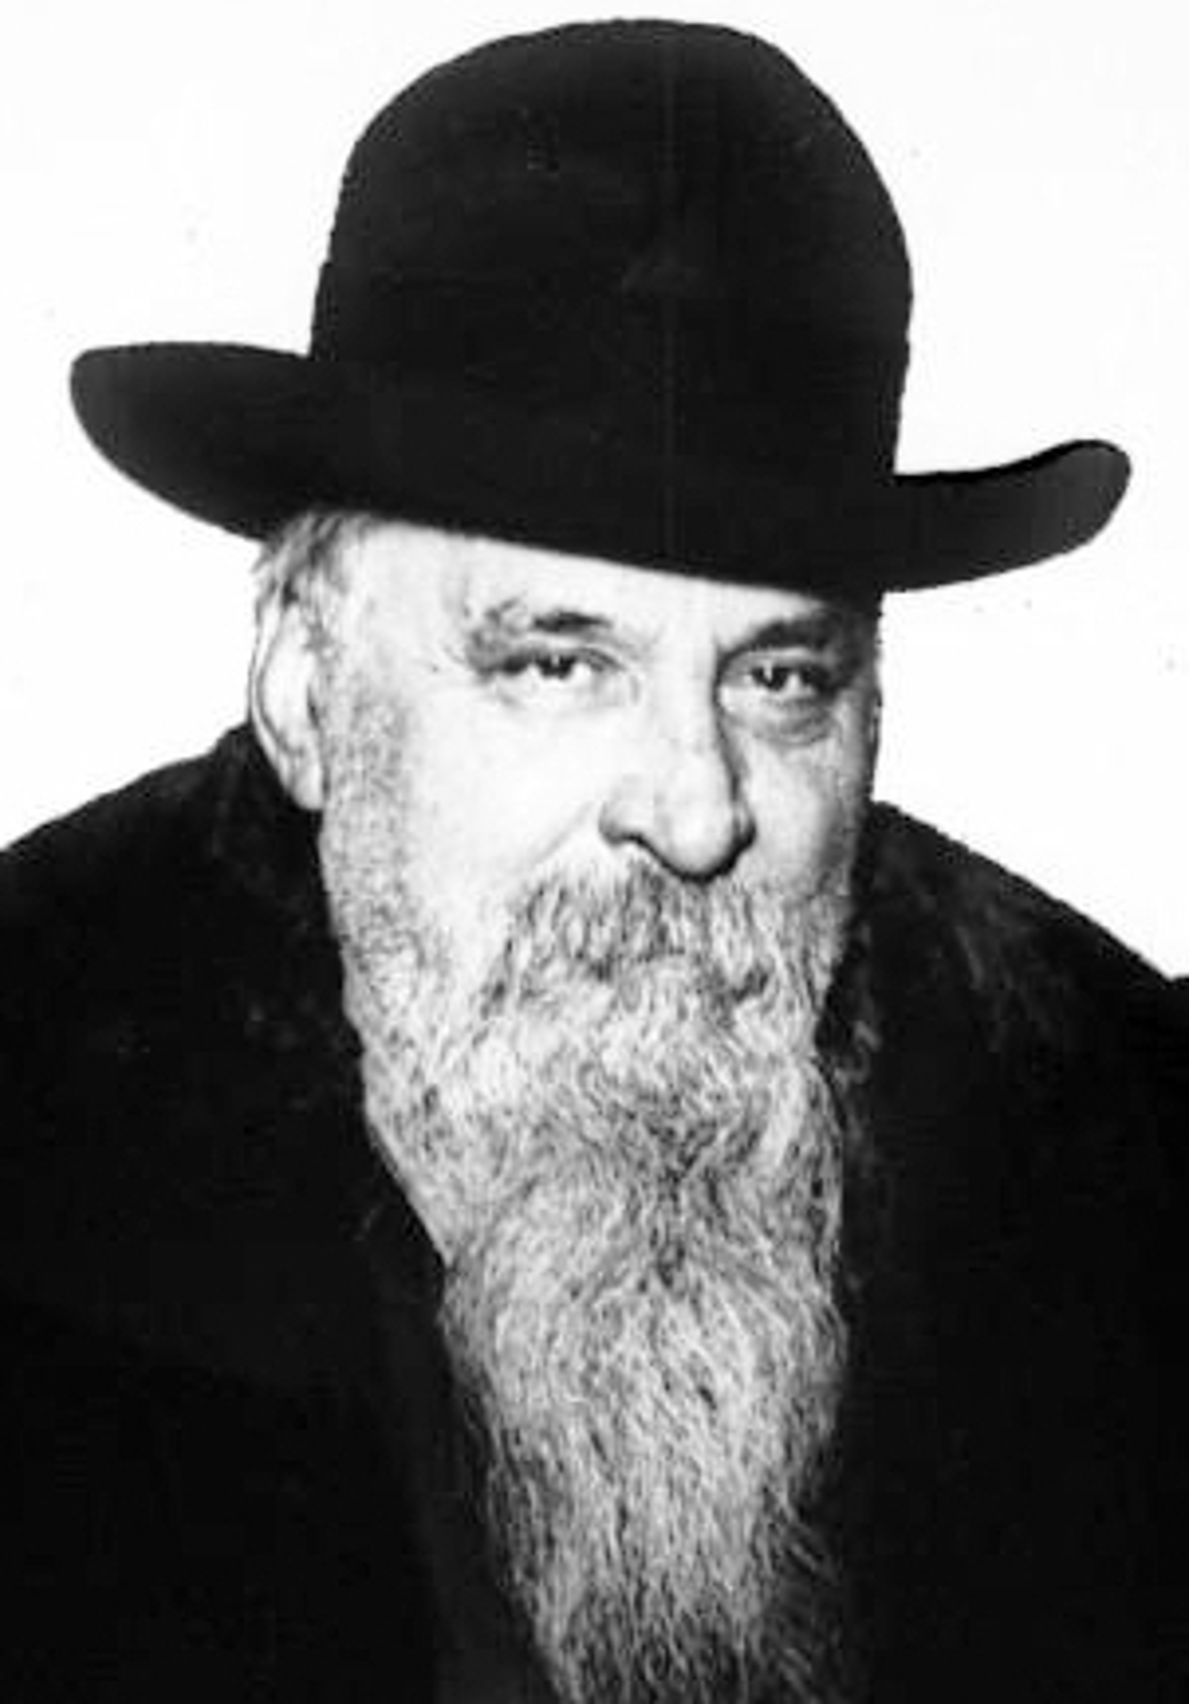 Ricciotti Garibaldi Wikidata